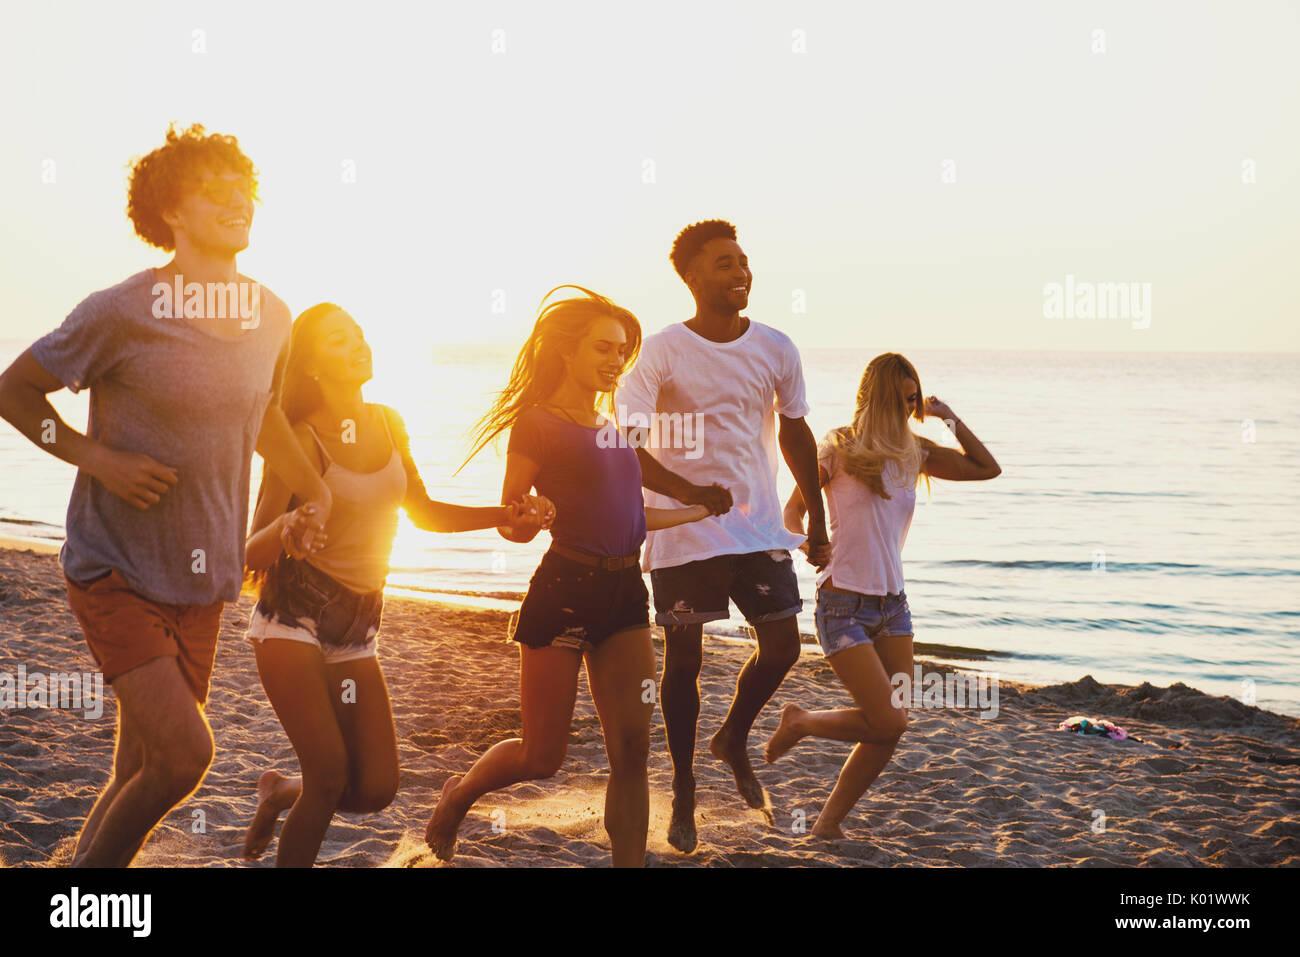 Group of happy friends having fun at ocean beach - Stock Image